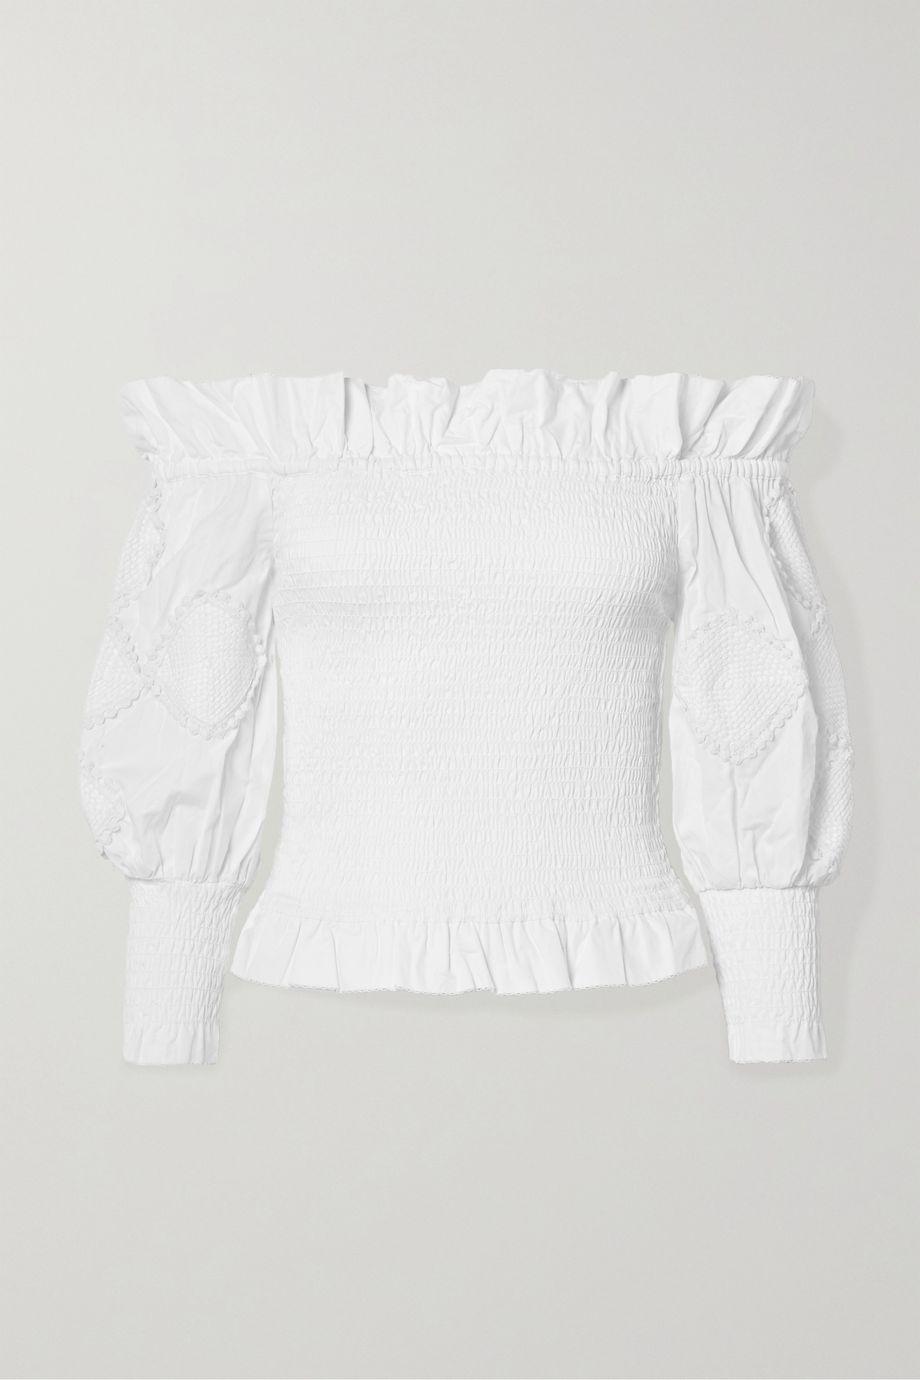 Chufy Miski off-the-shoulder crochet-trimmed shirred cotton top